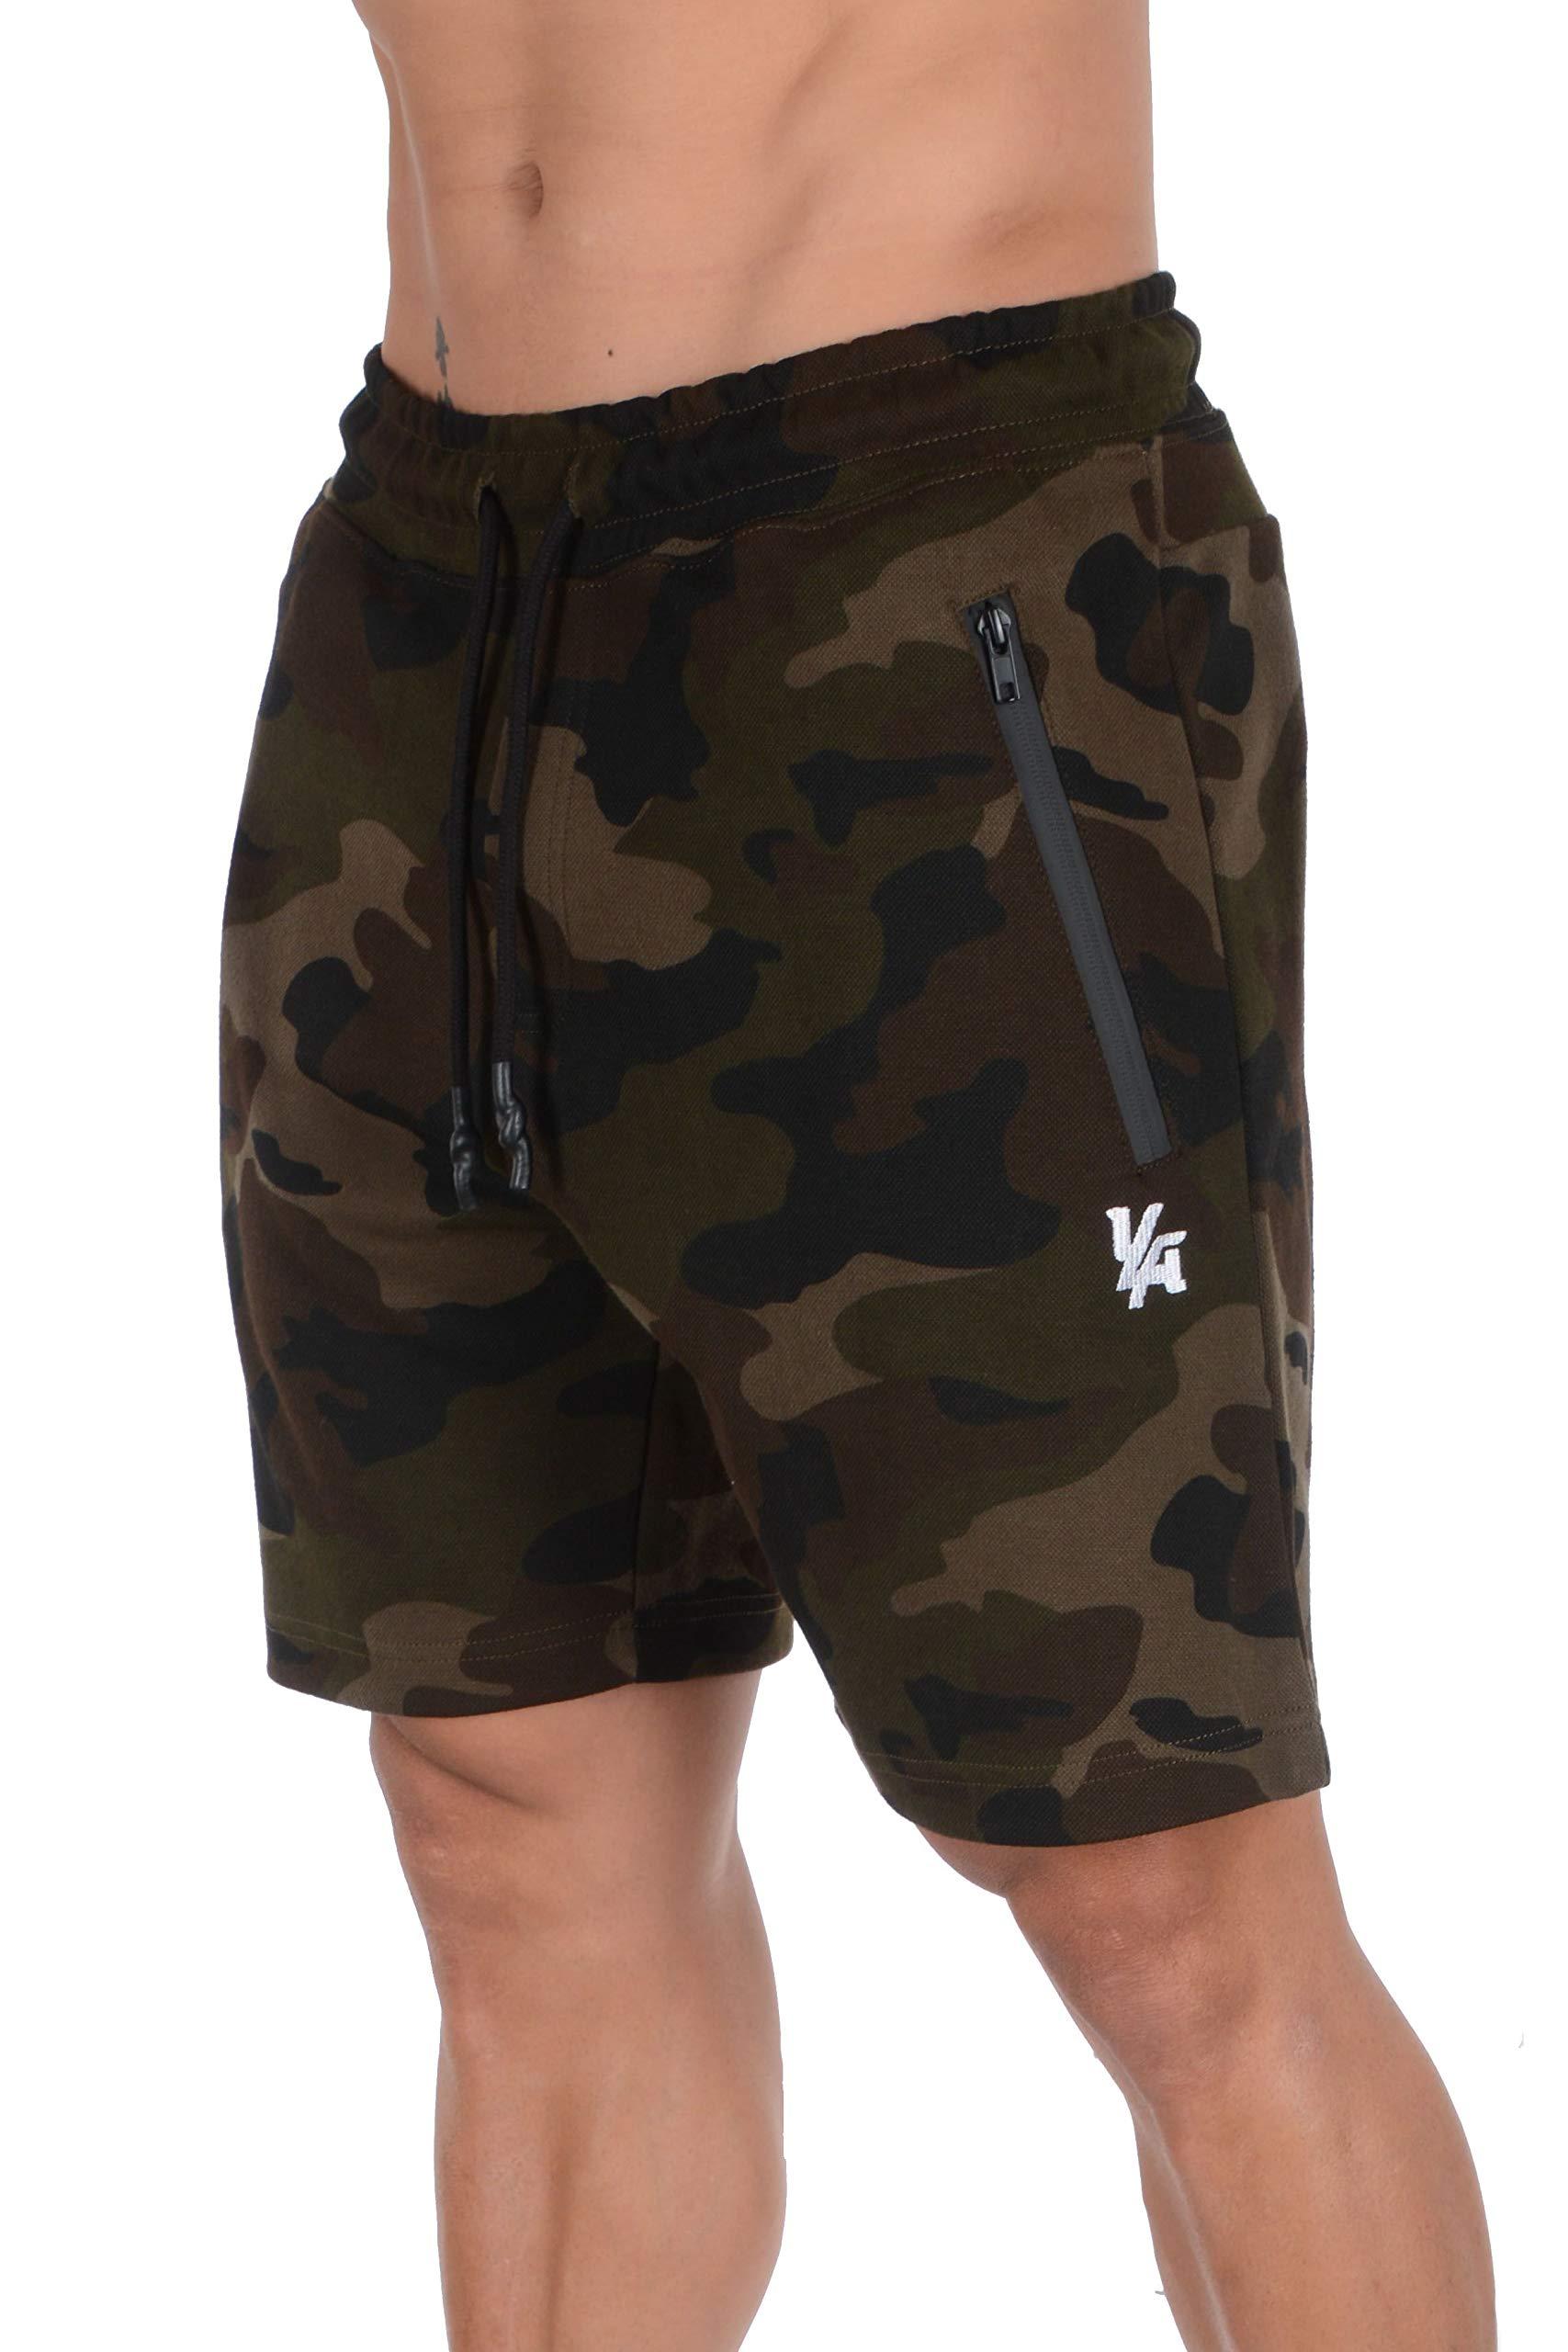 YoungLA Mens Shorts with Zipper Pockets | Casual Gym Training 108 | Camo Green Medium by YoungLA